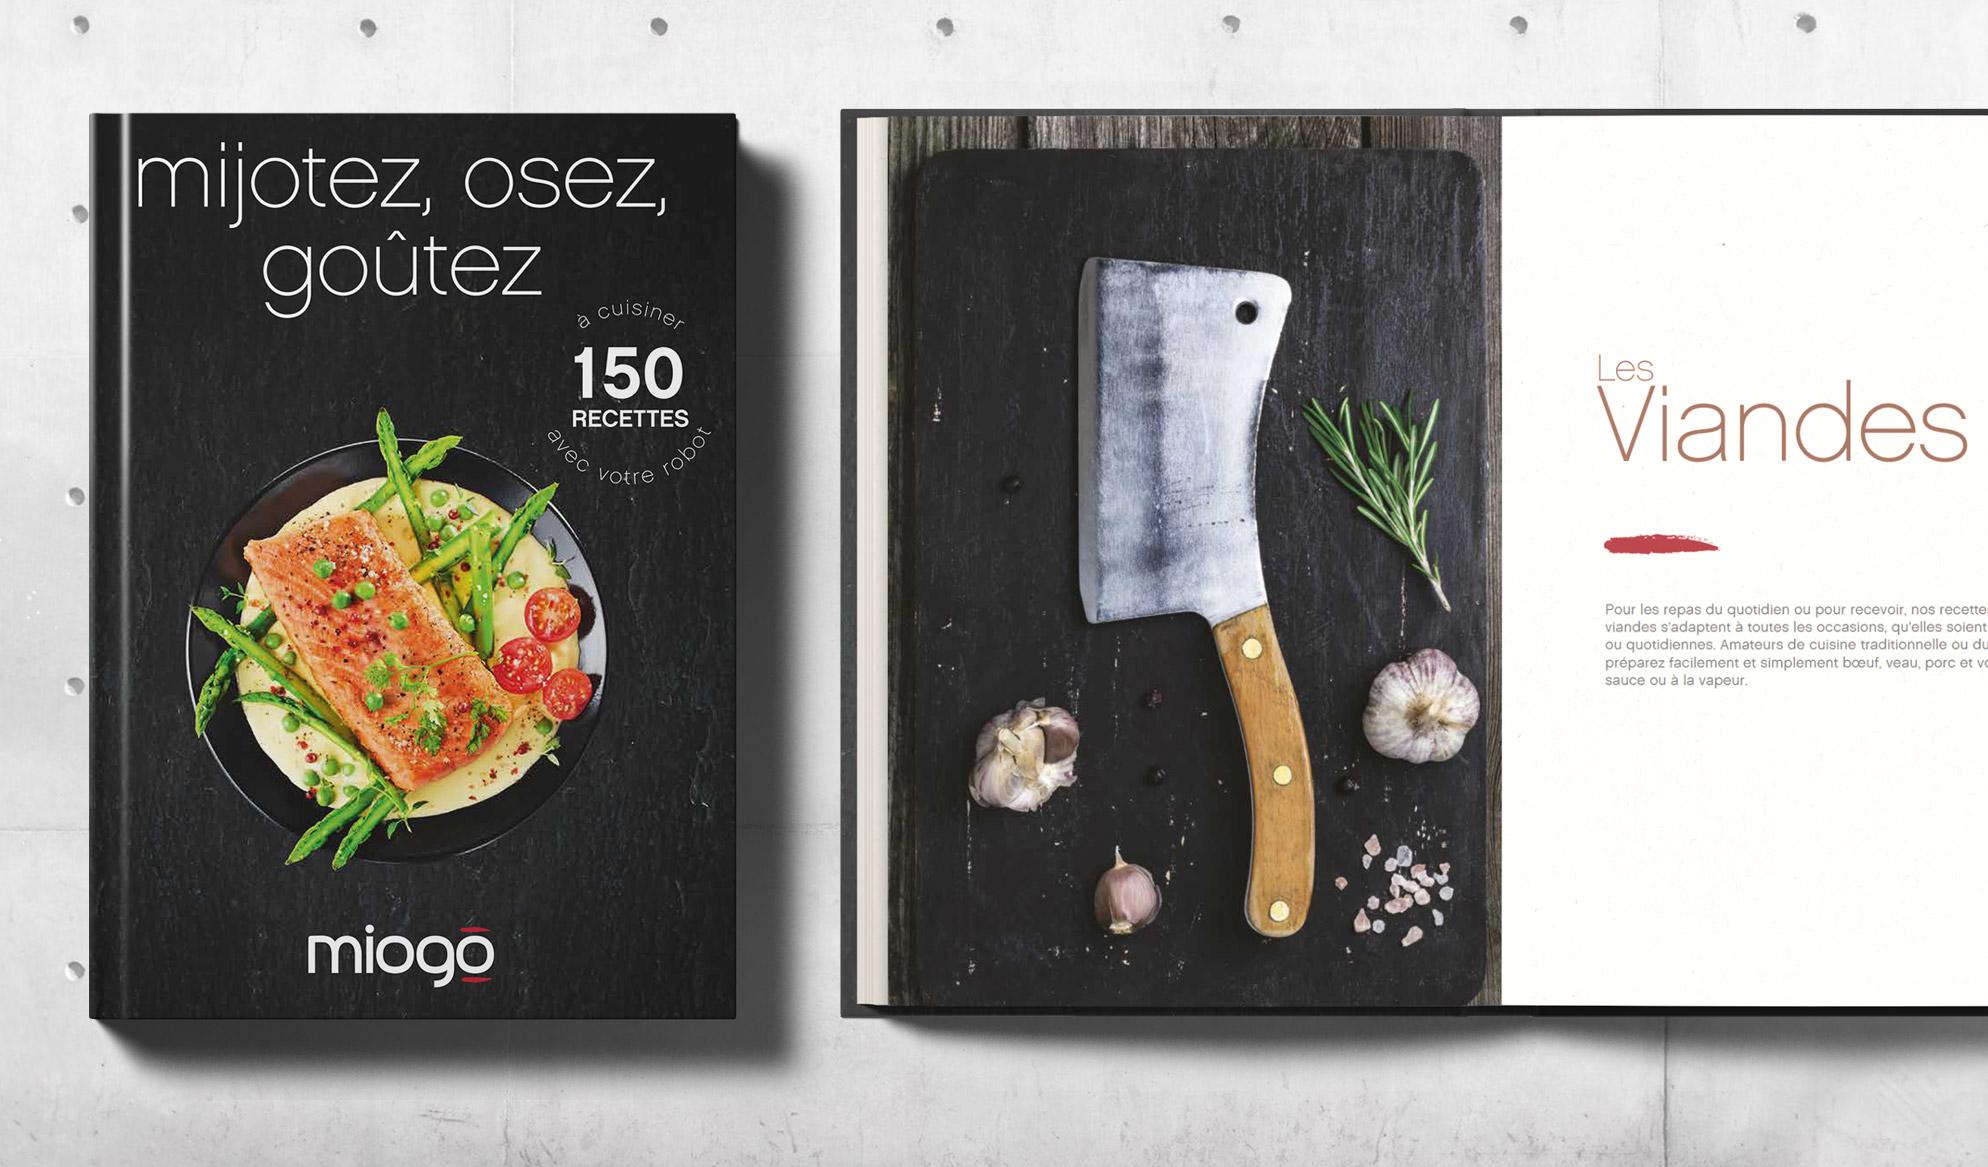 Photo livre recette Miogo Boulanger